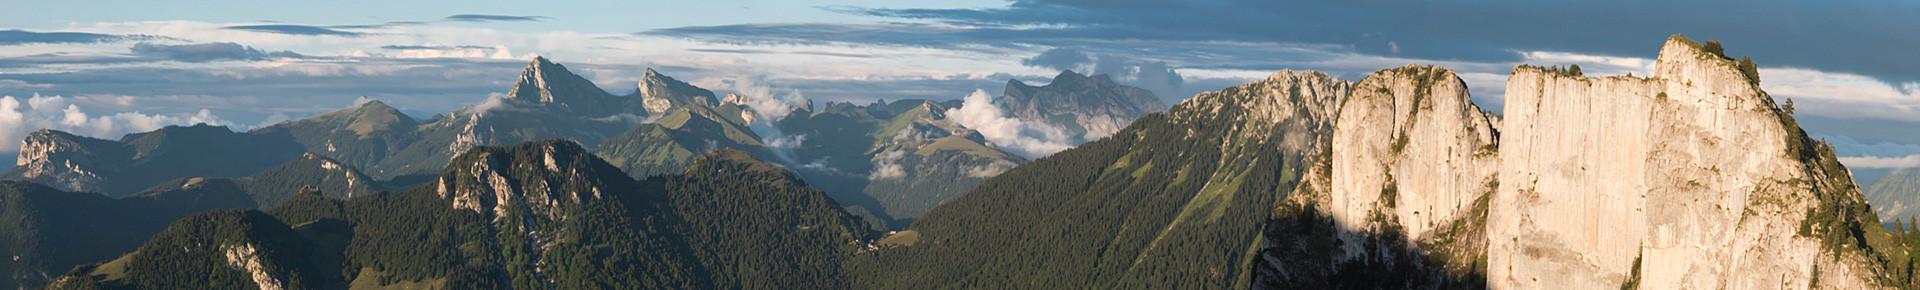 Balades et randonnées en Vallée d'Aulps